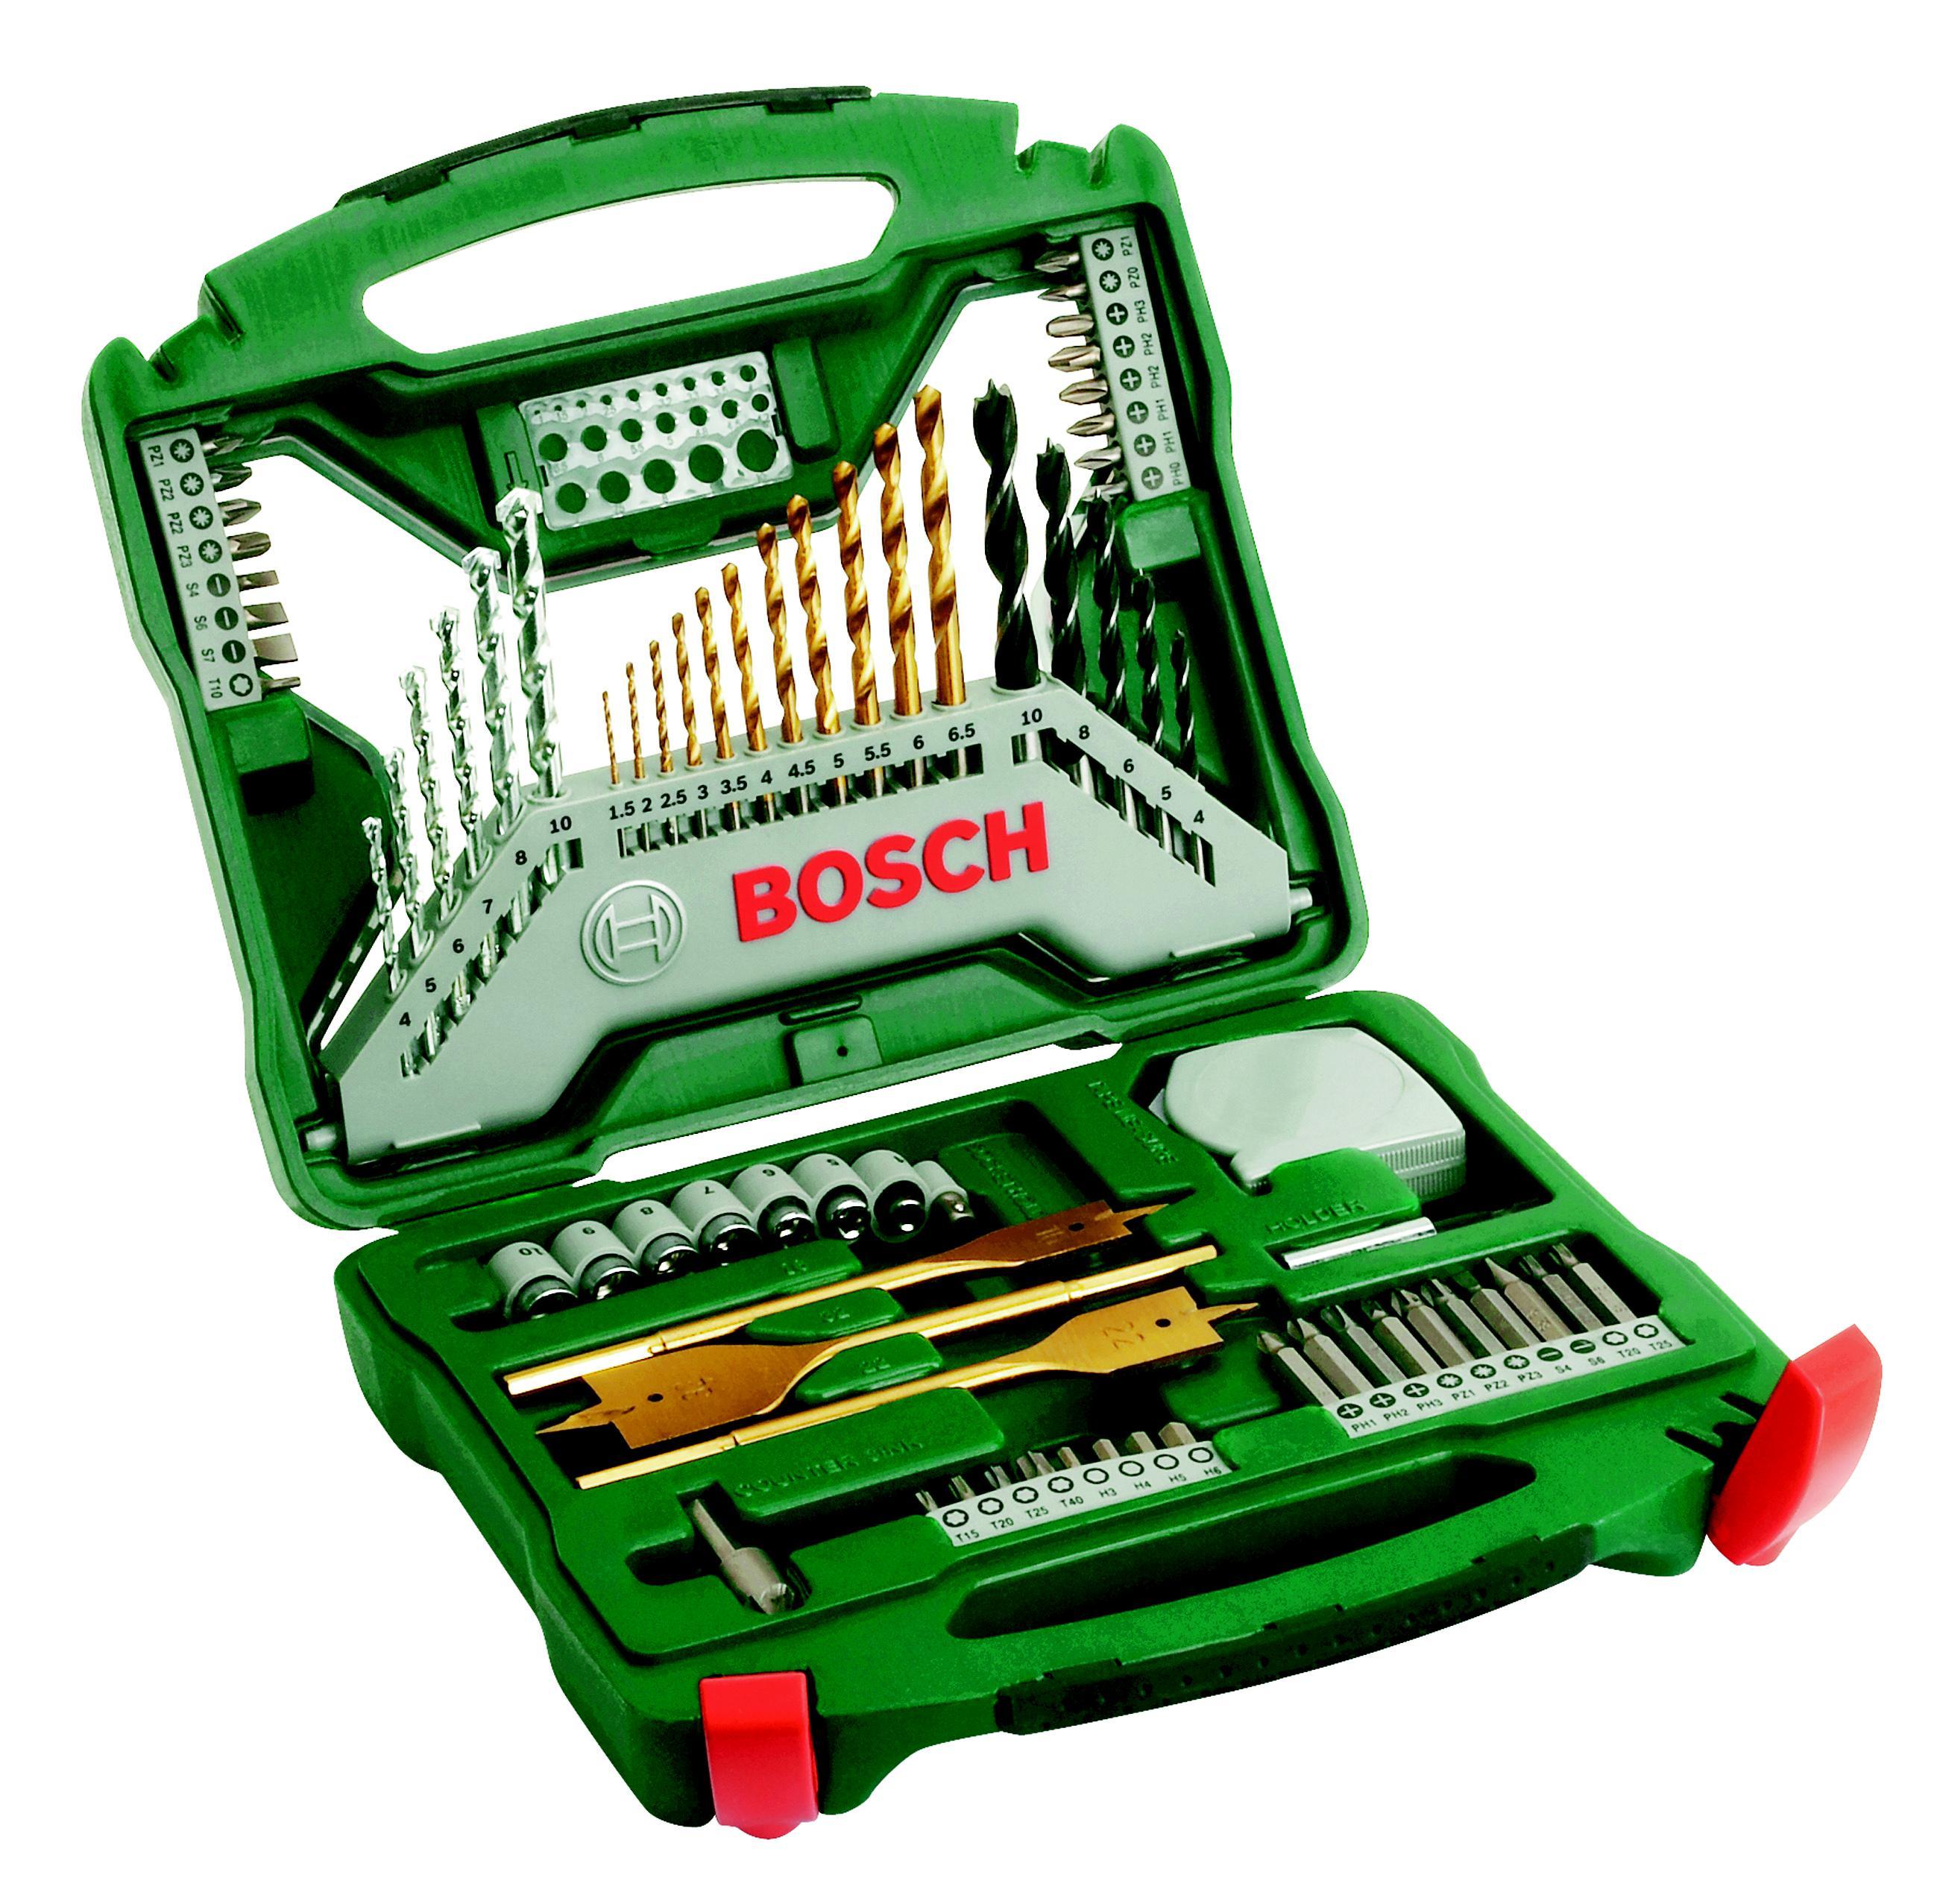 Набор бит и сверл Bosch X-line-70 promoline (2.607.019.329) набор сверл и бит bosch x line 70 70 предметов 2607019329